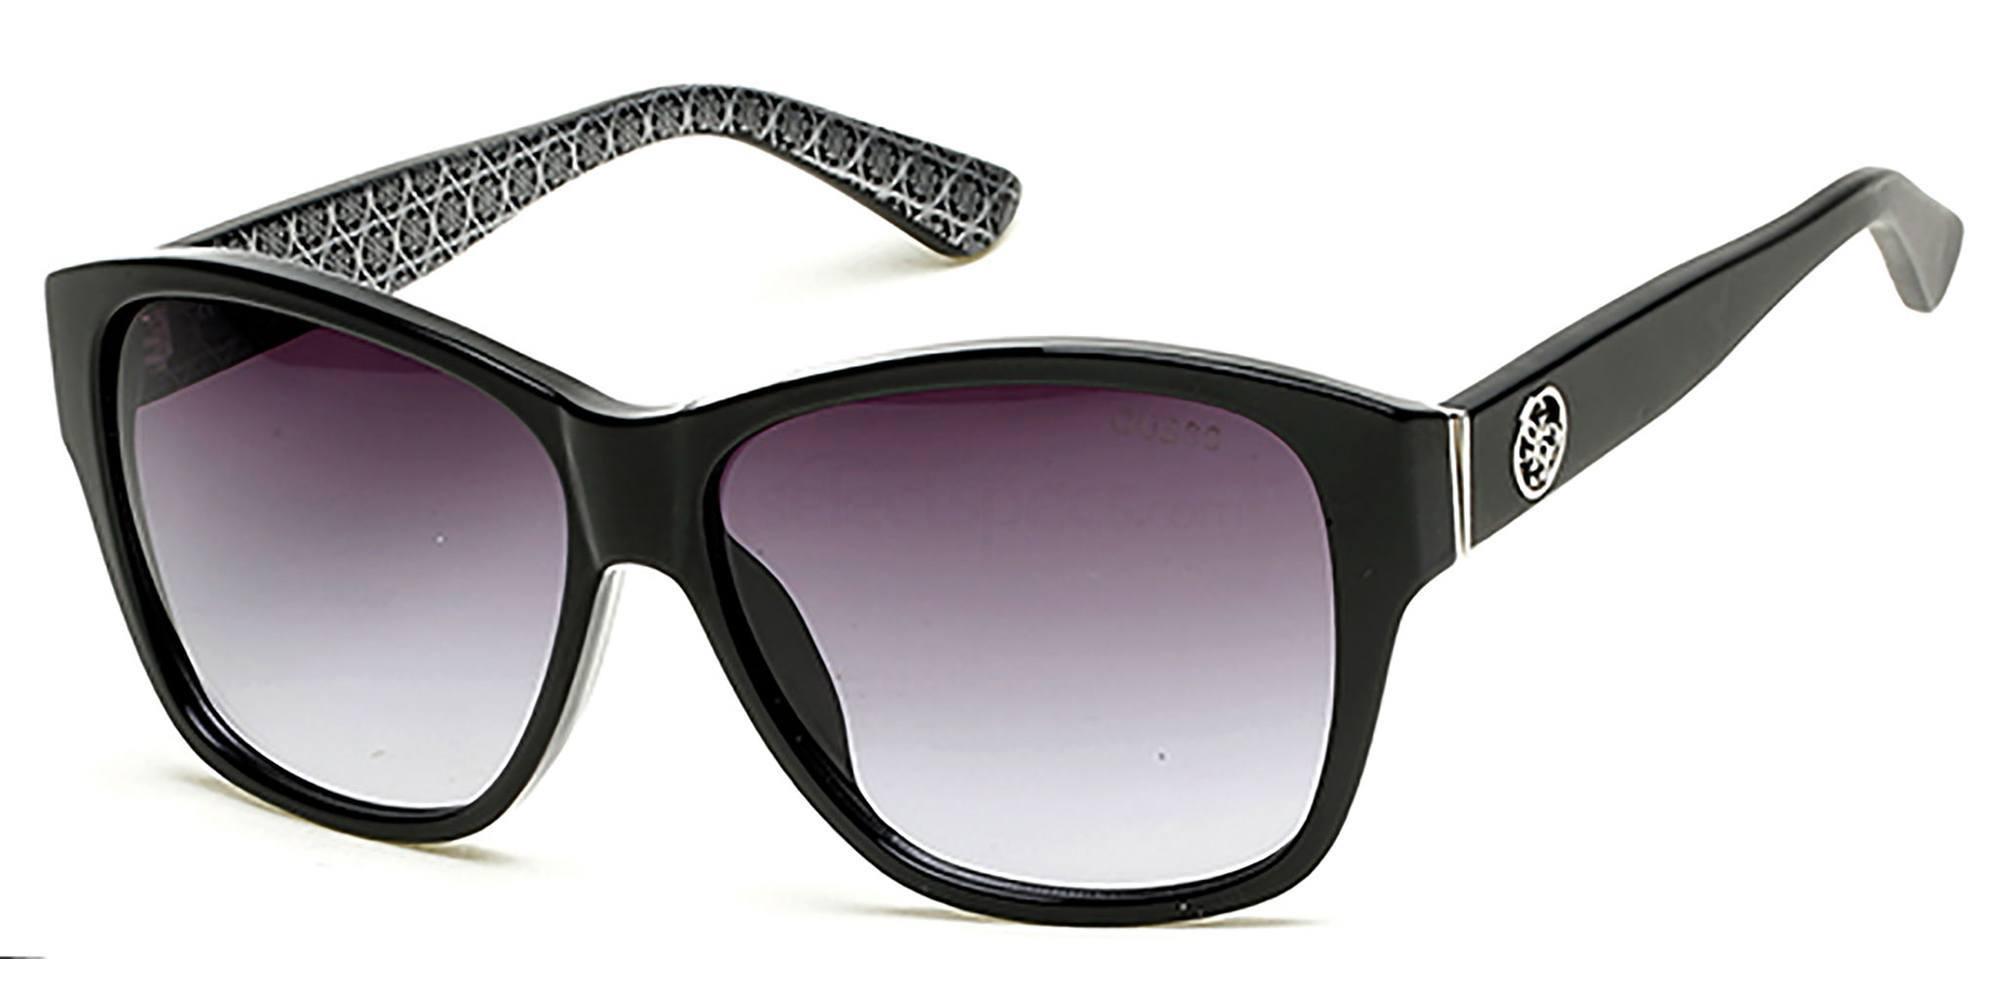 01B GU7412 Sunglasses, Guess